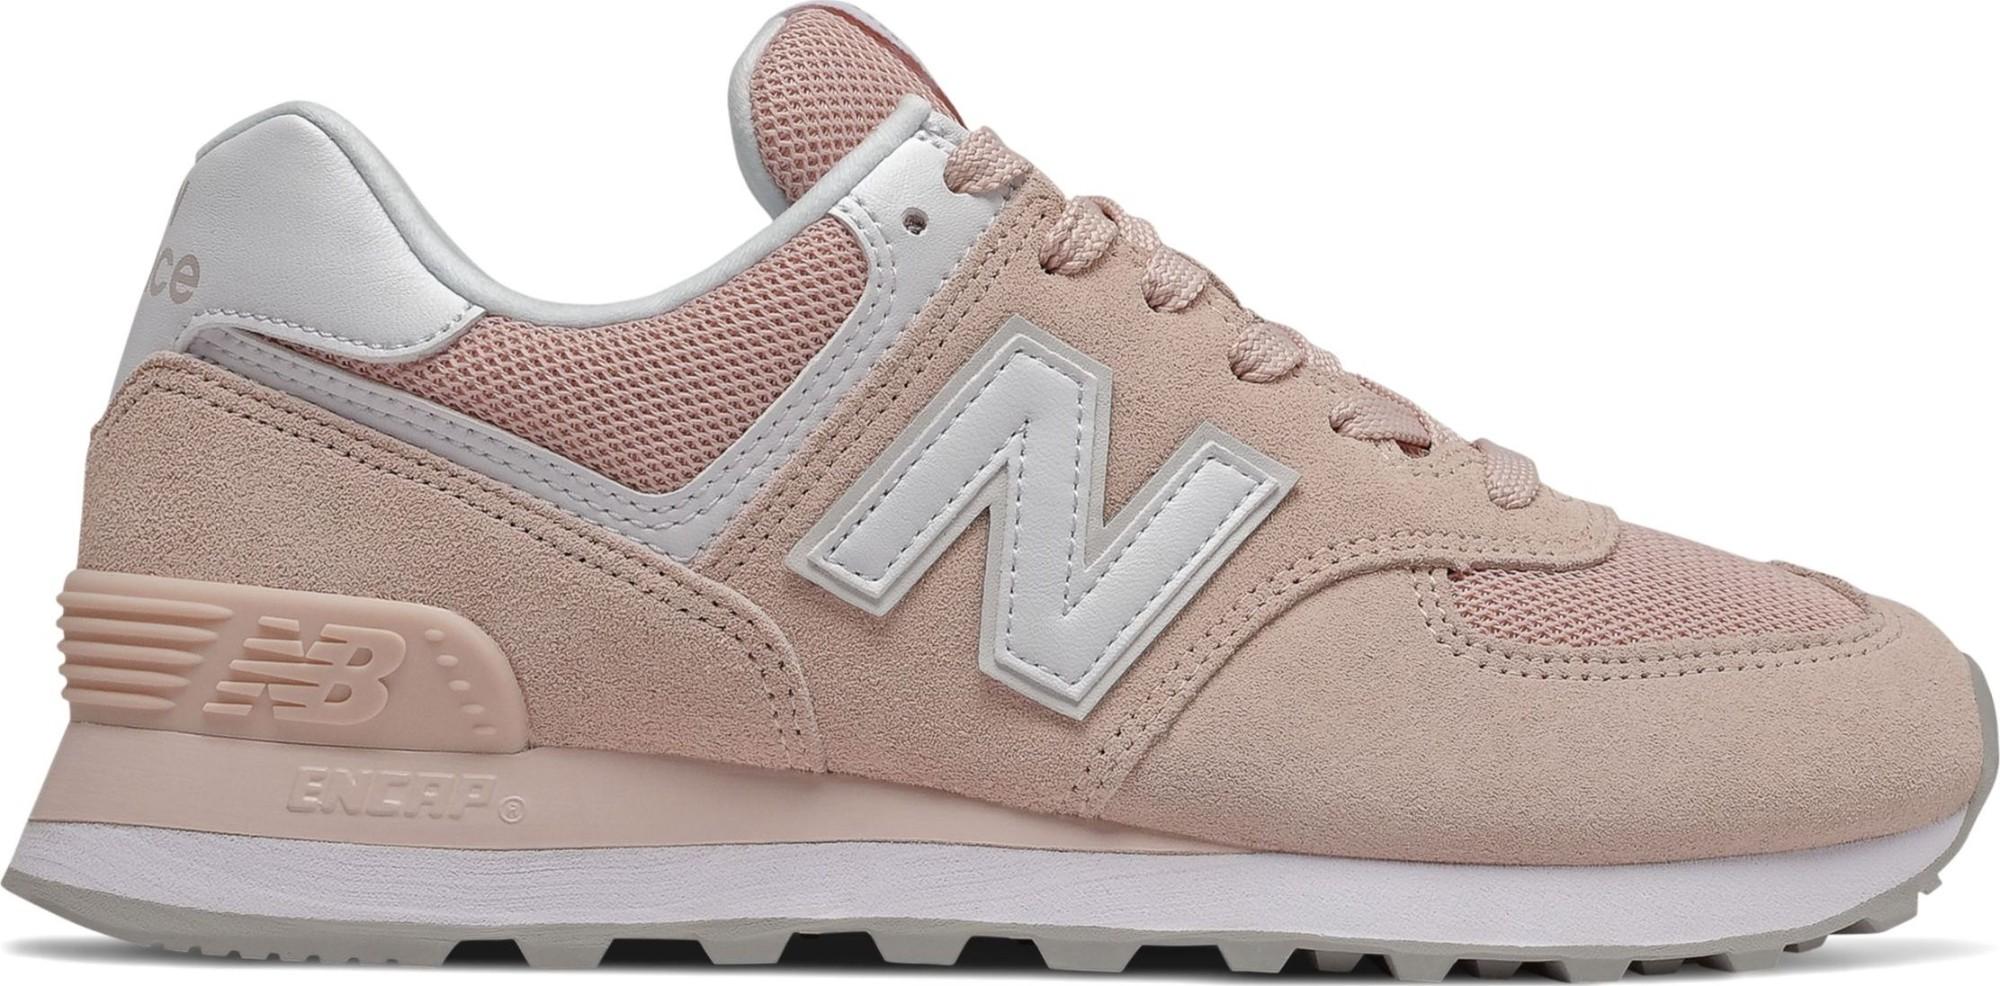 New Balance WL574 Nubuck Pink/White 37,5